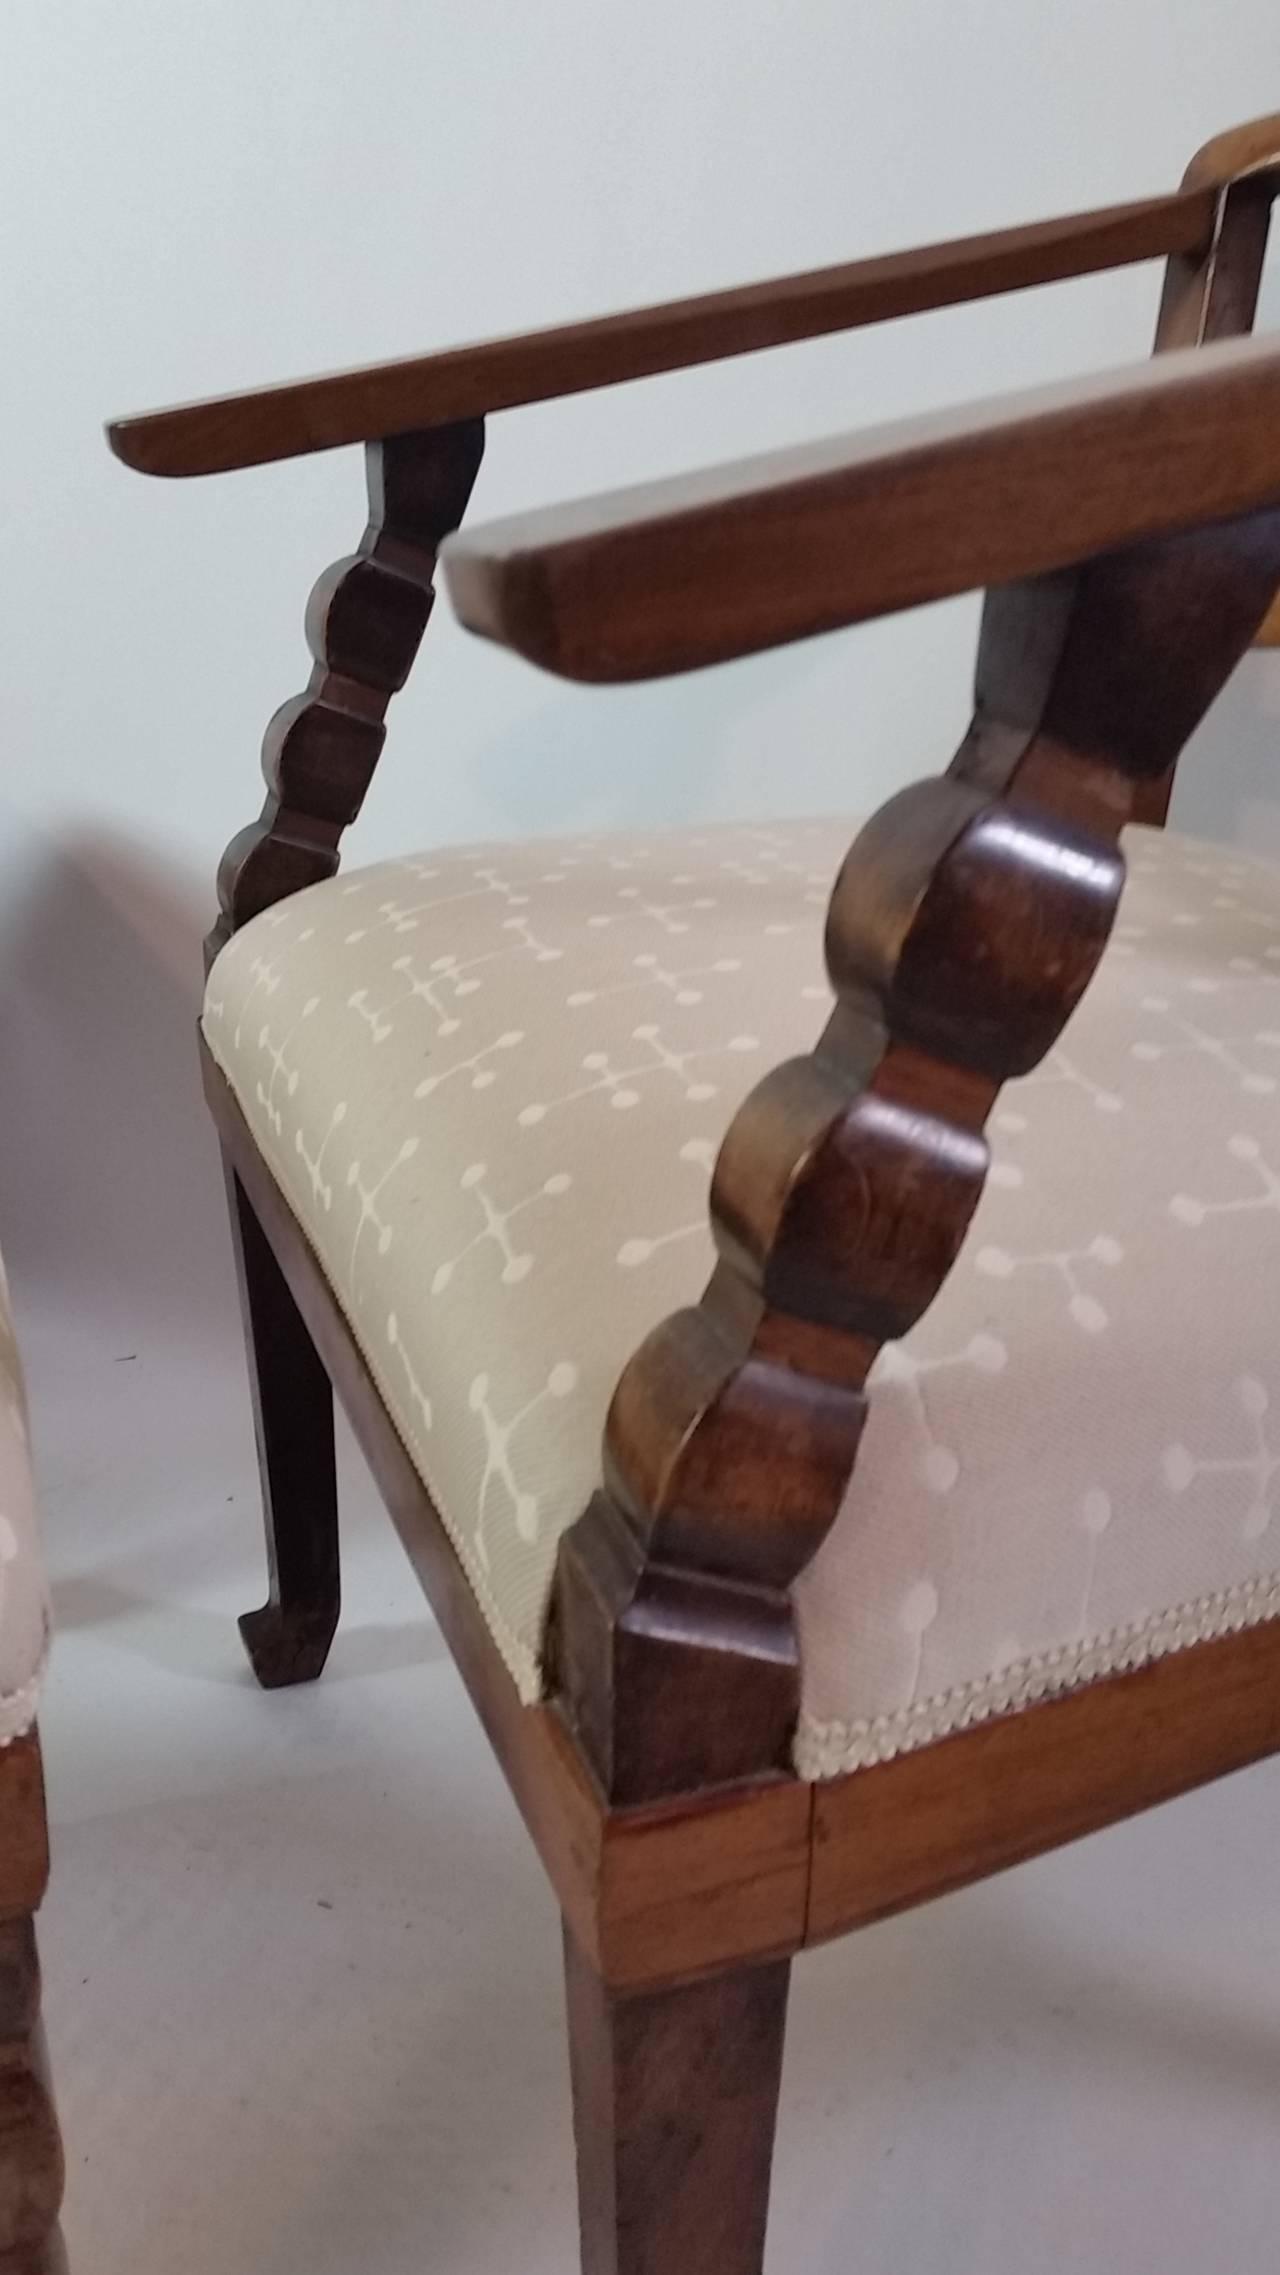 Upholstery Italian, Venetian fruitwood Armchairs with Ottoman, circa 1925 For Sale